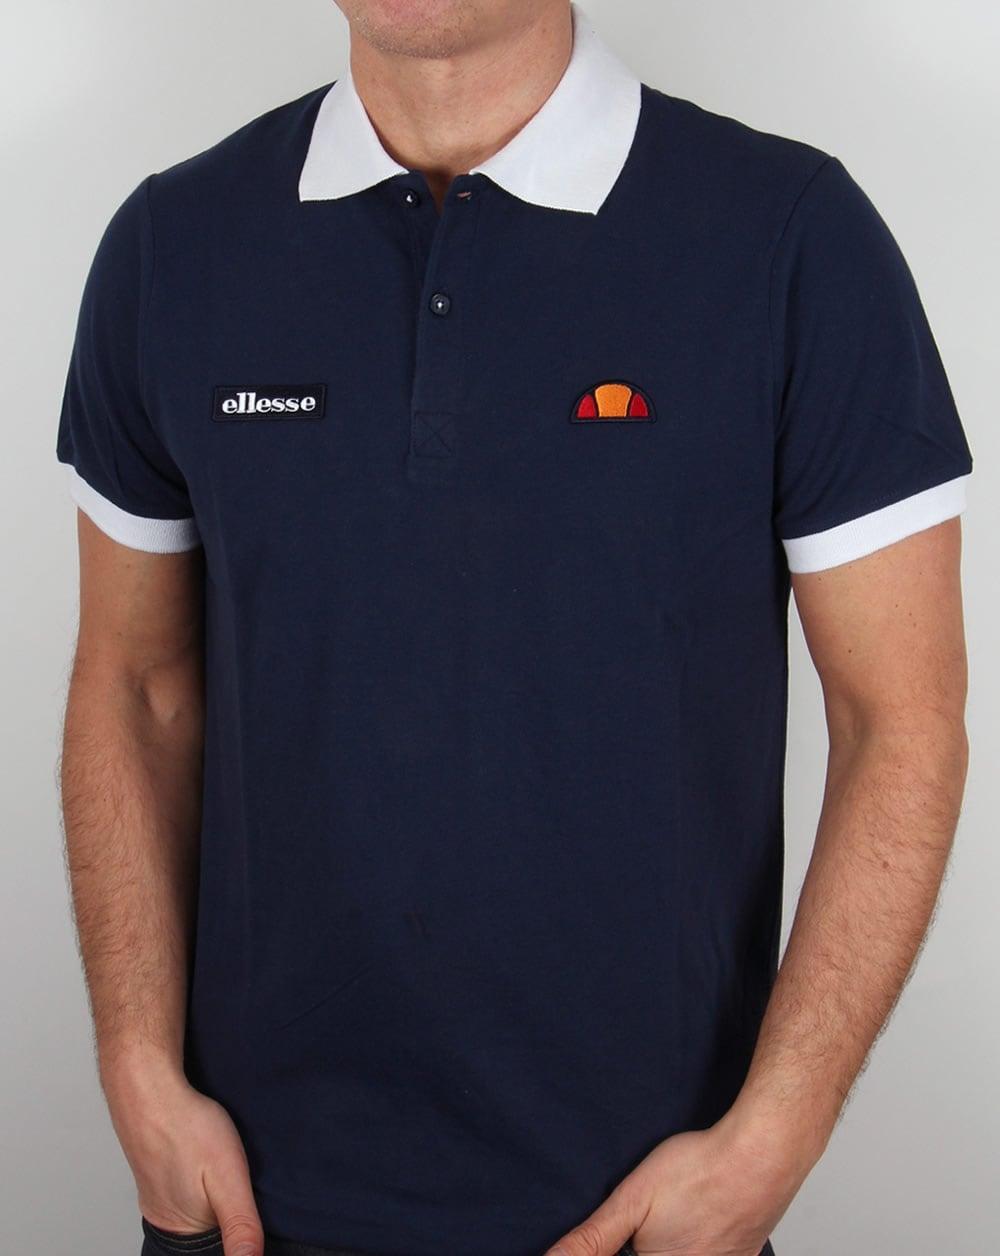 Ellesse lessepsia 17 polo shirt navy pique cotton mens for Mens navy polo shirt